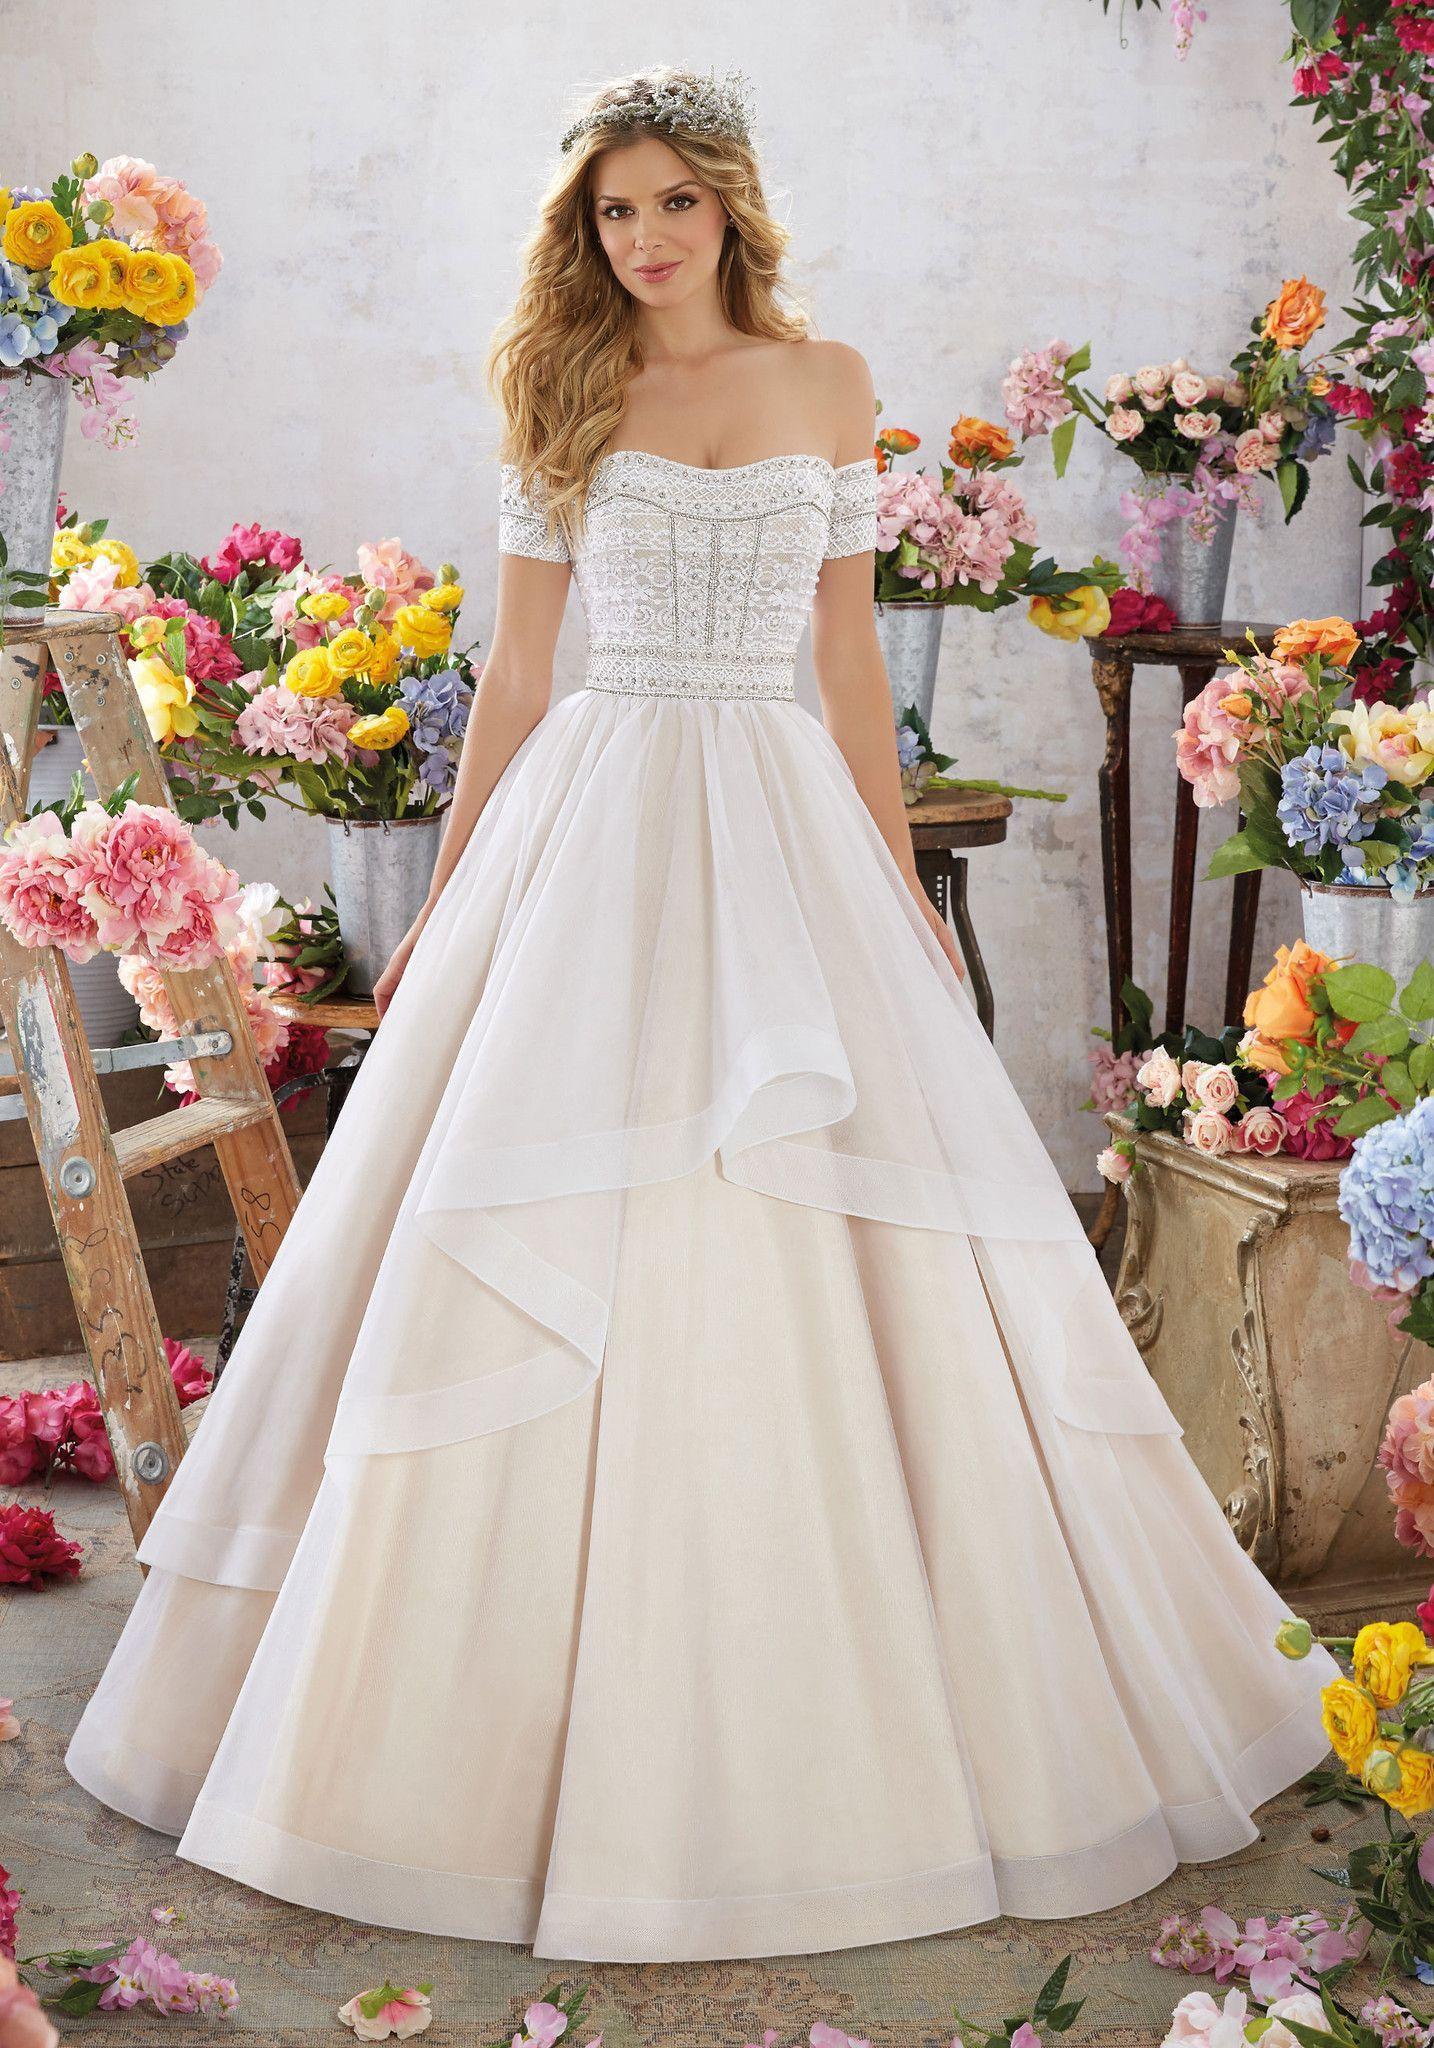 Simple off white wedding dresses  Voyage  Megara    All Dressed Up Bridal Gown  tyxgbaj